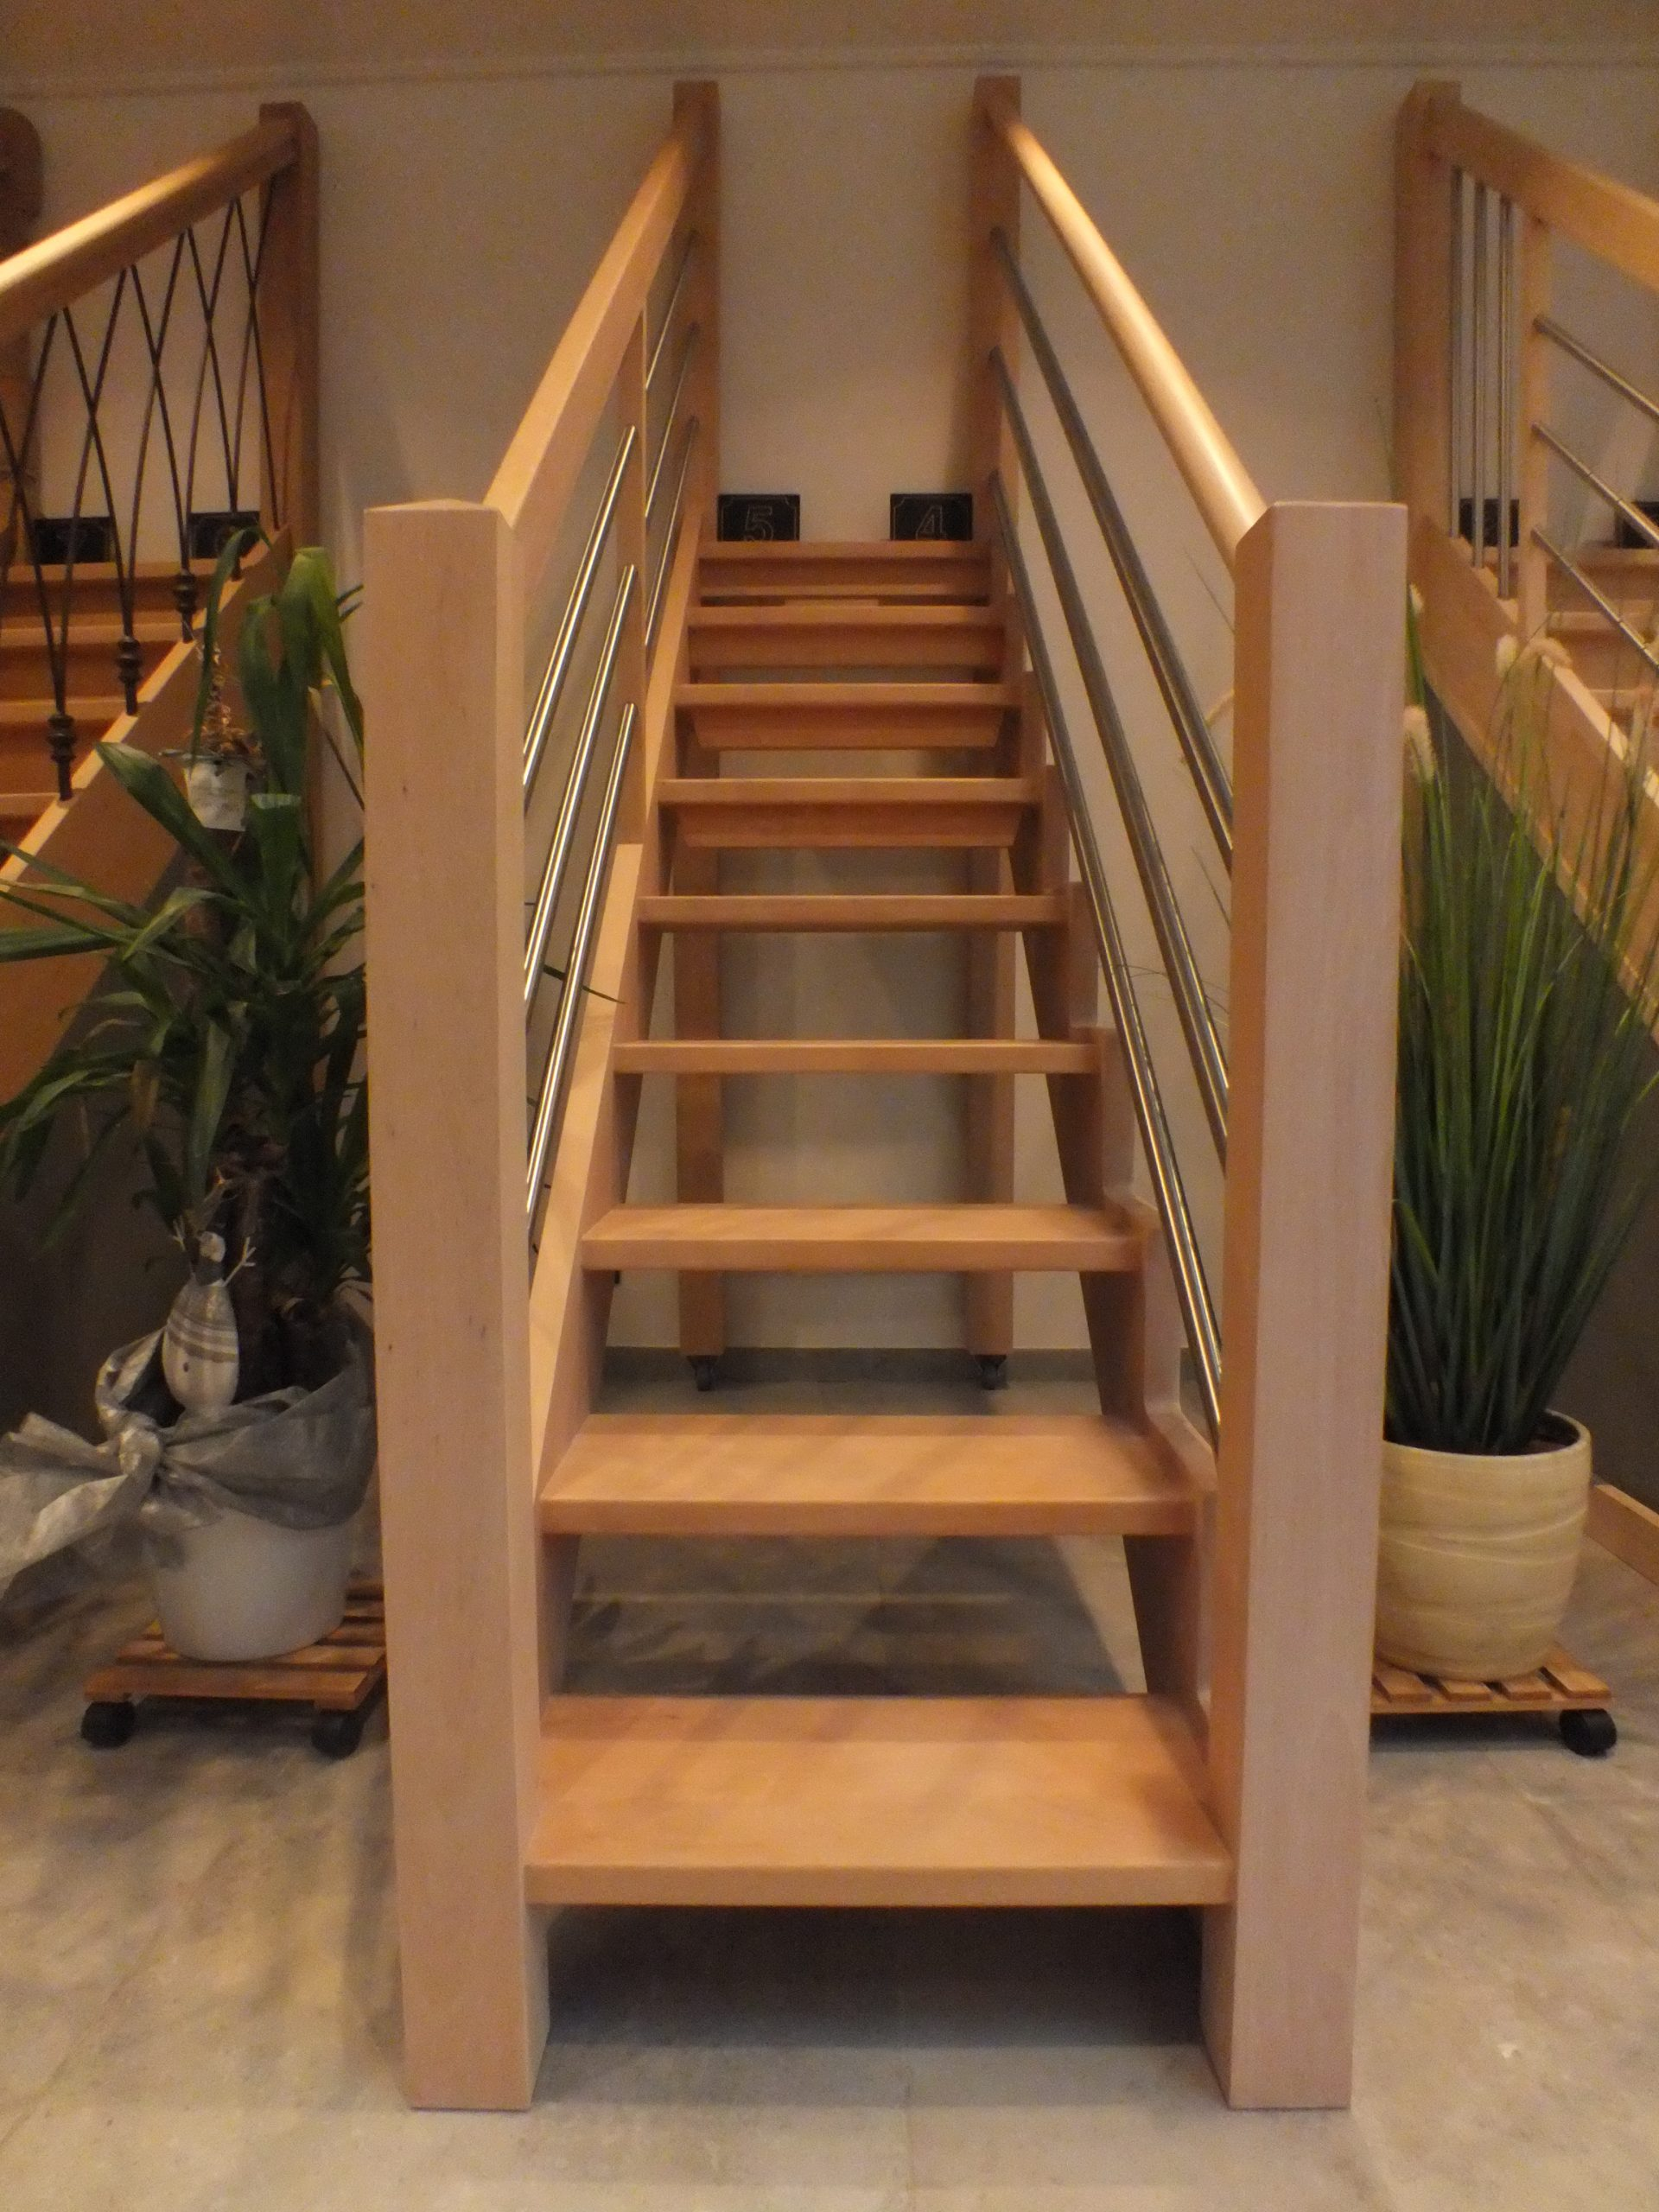 Huile Pour Escalier Hetre showroom | menuiserie alain charlier & fils